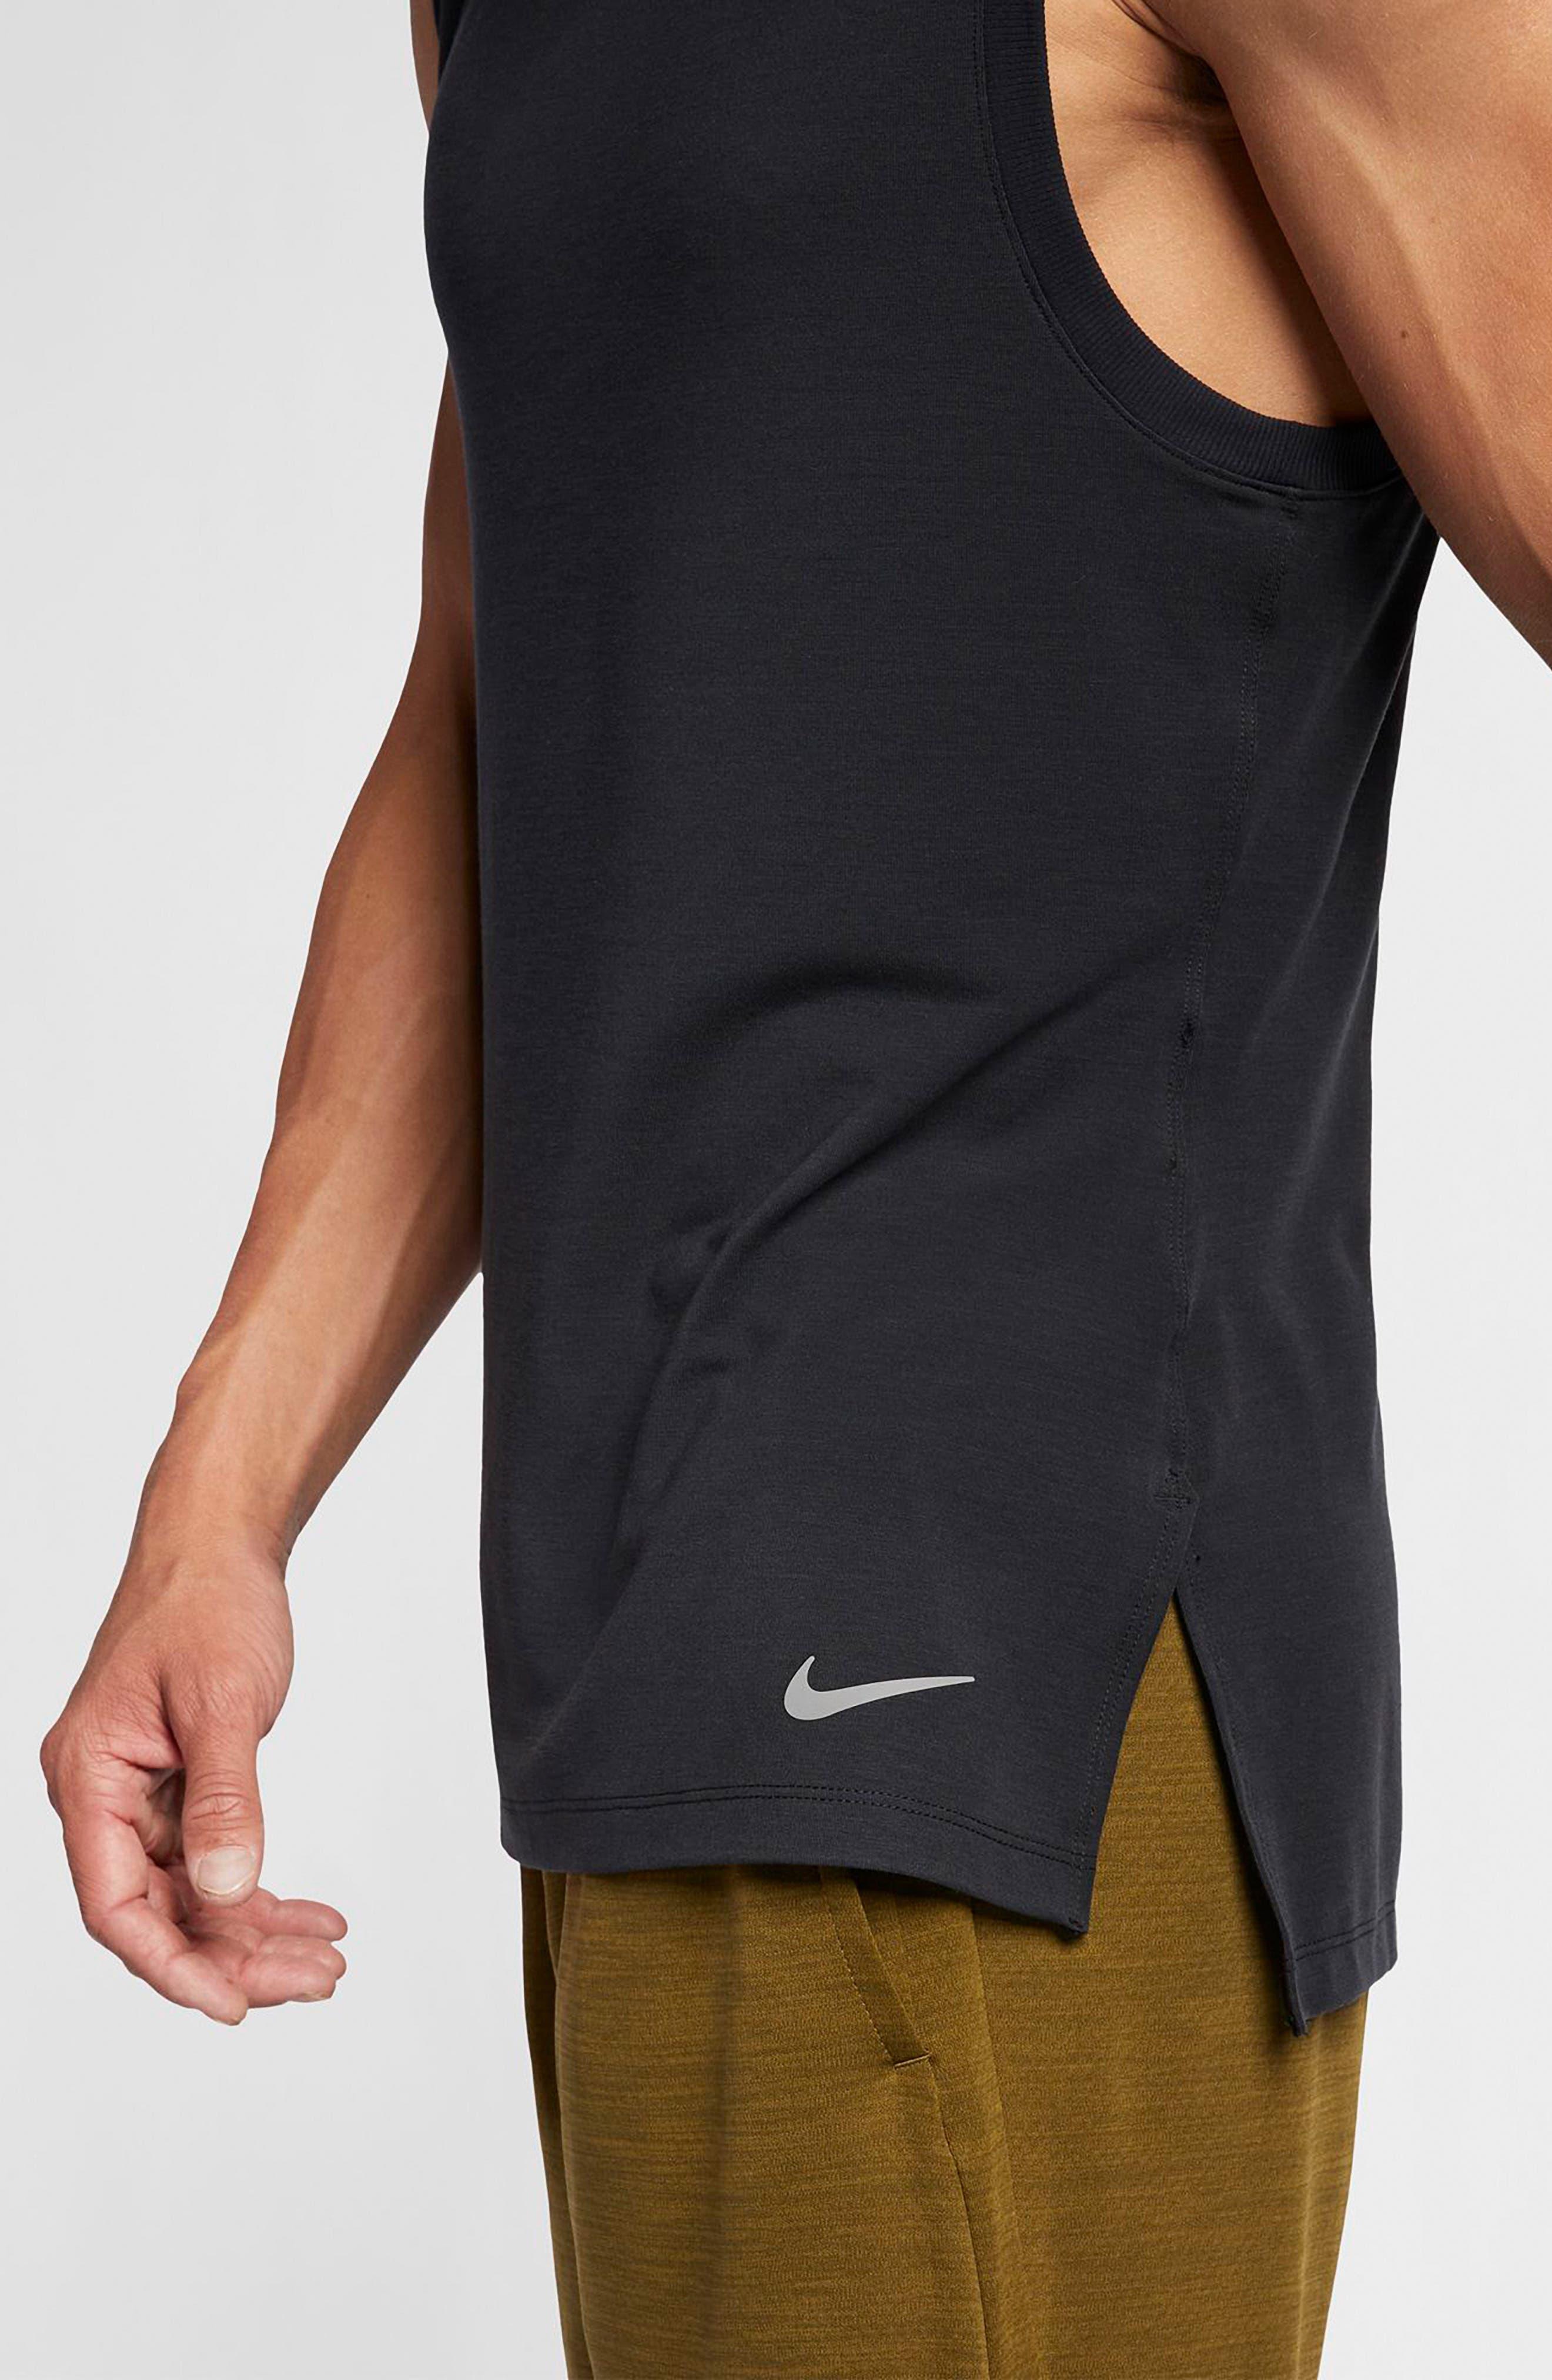 NIKE, Dry Transcent Sleeveless T-Shirt, Alternate thumbnail 7, color, BLACK/ DARK GREY